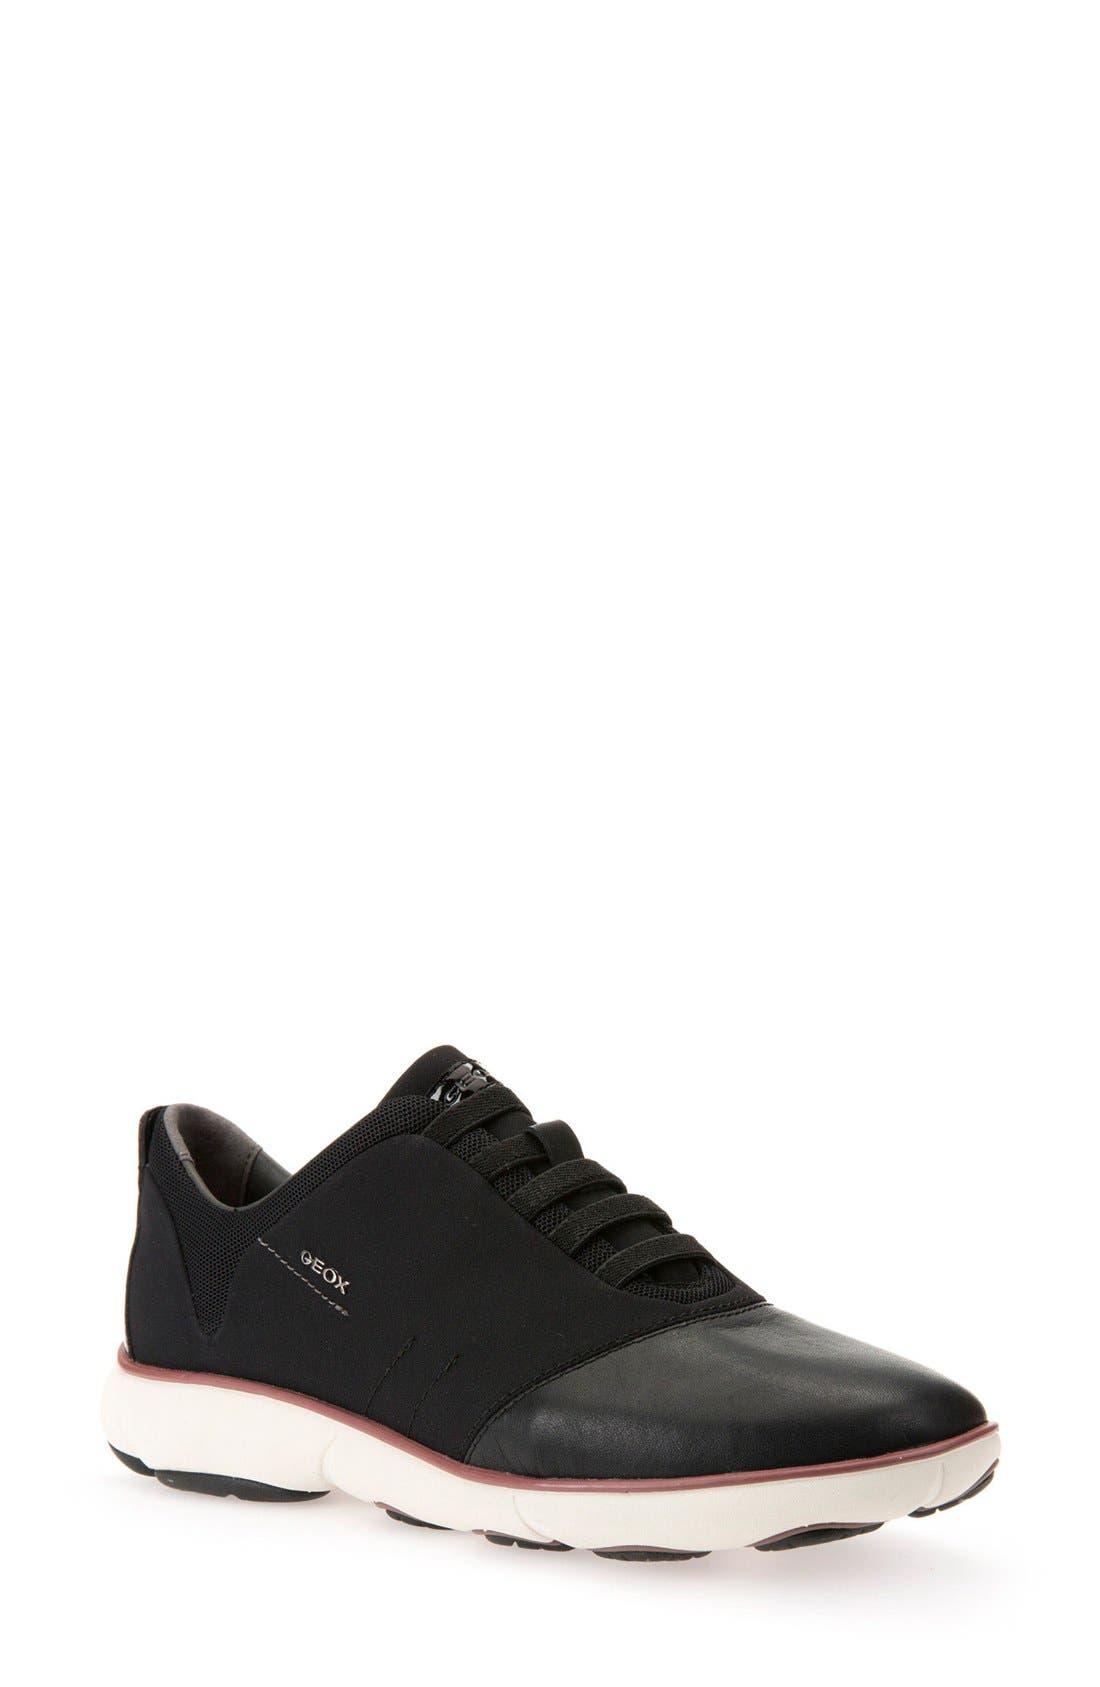 'Nebula' Sneaker,                             Main thumbnail 1, color,                             001